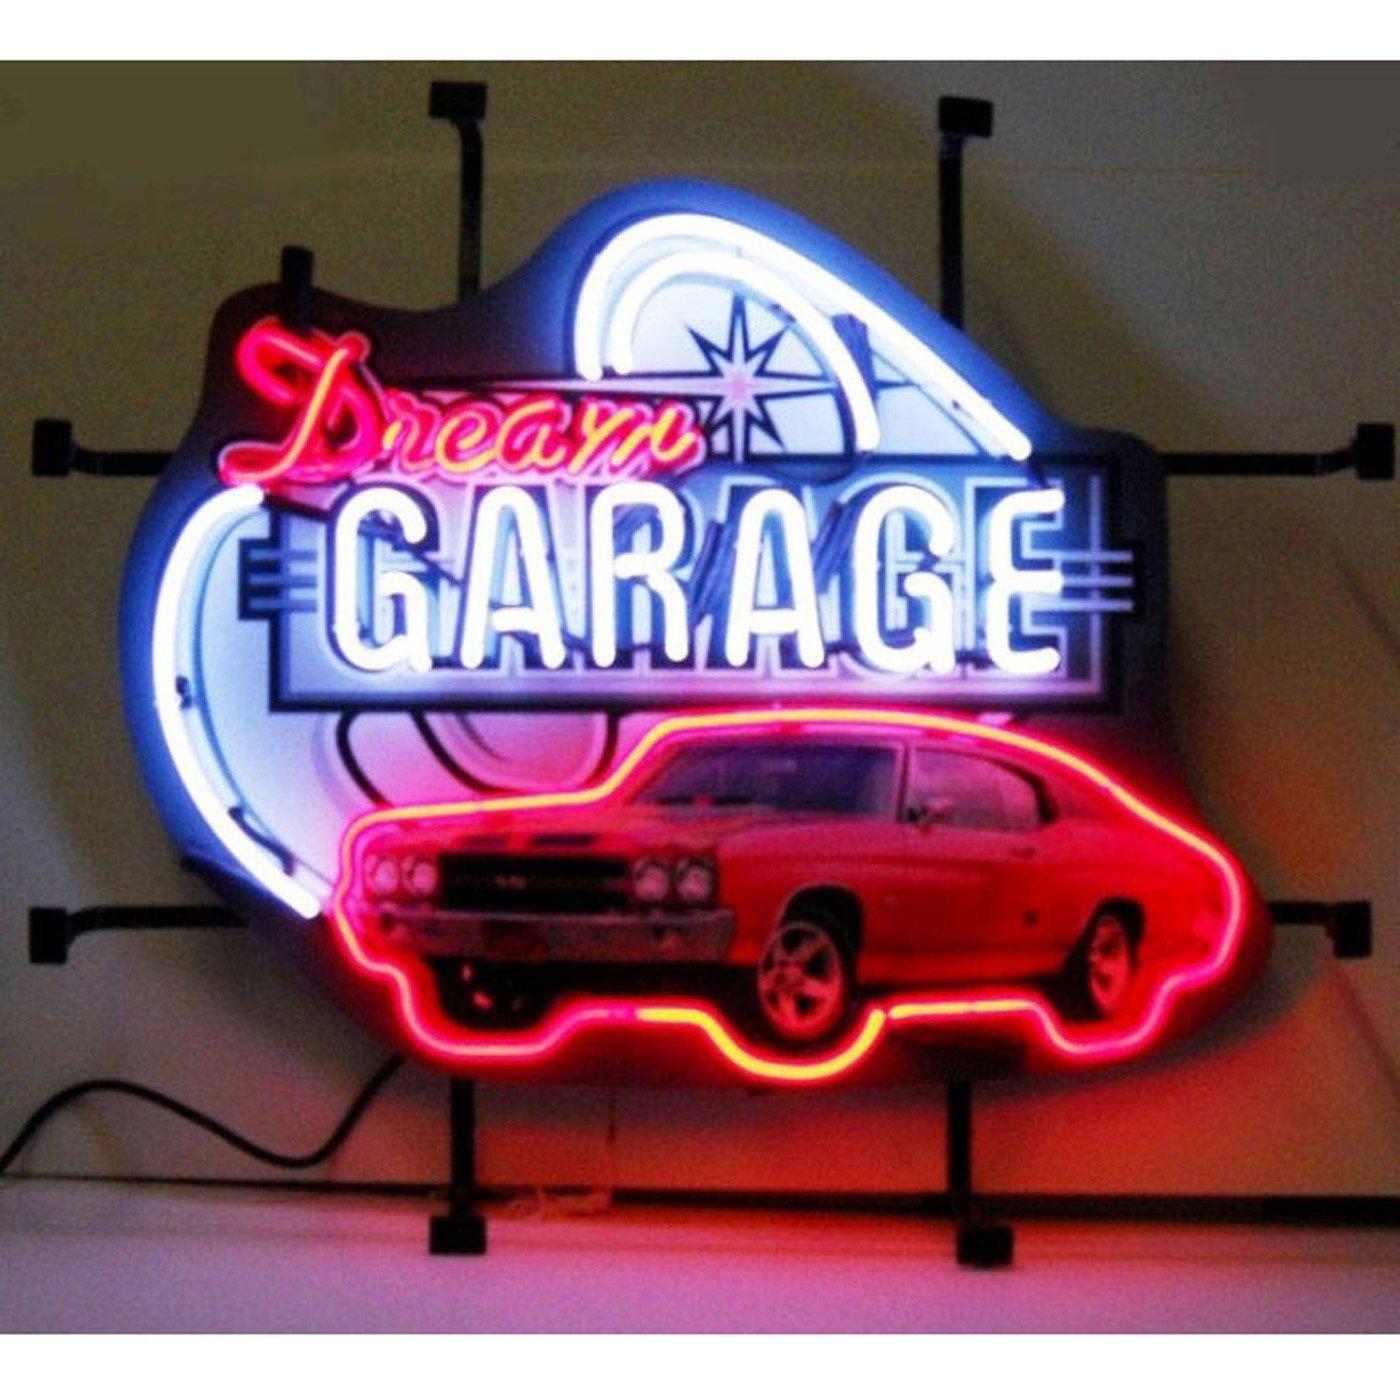 Neonetics Home Indoor Pub Restaurant Hotel Room Decorative Dream Garage Chevy...